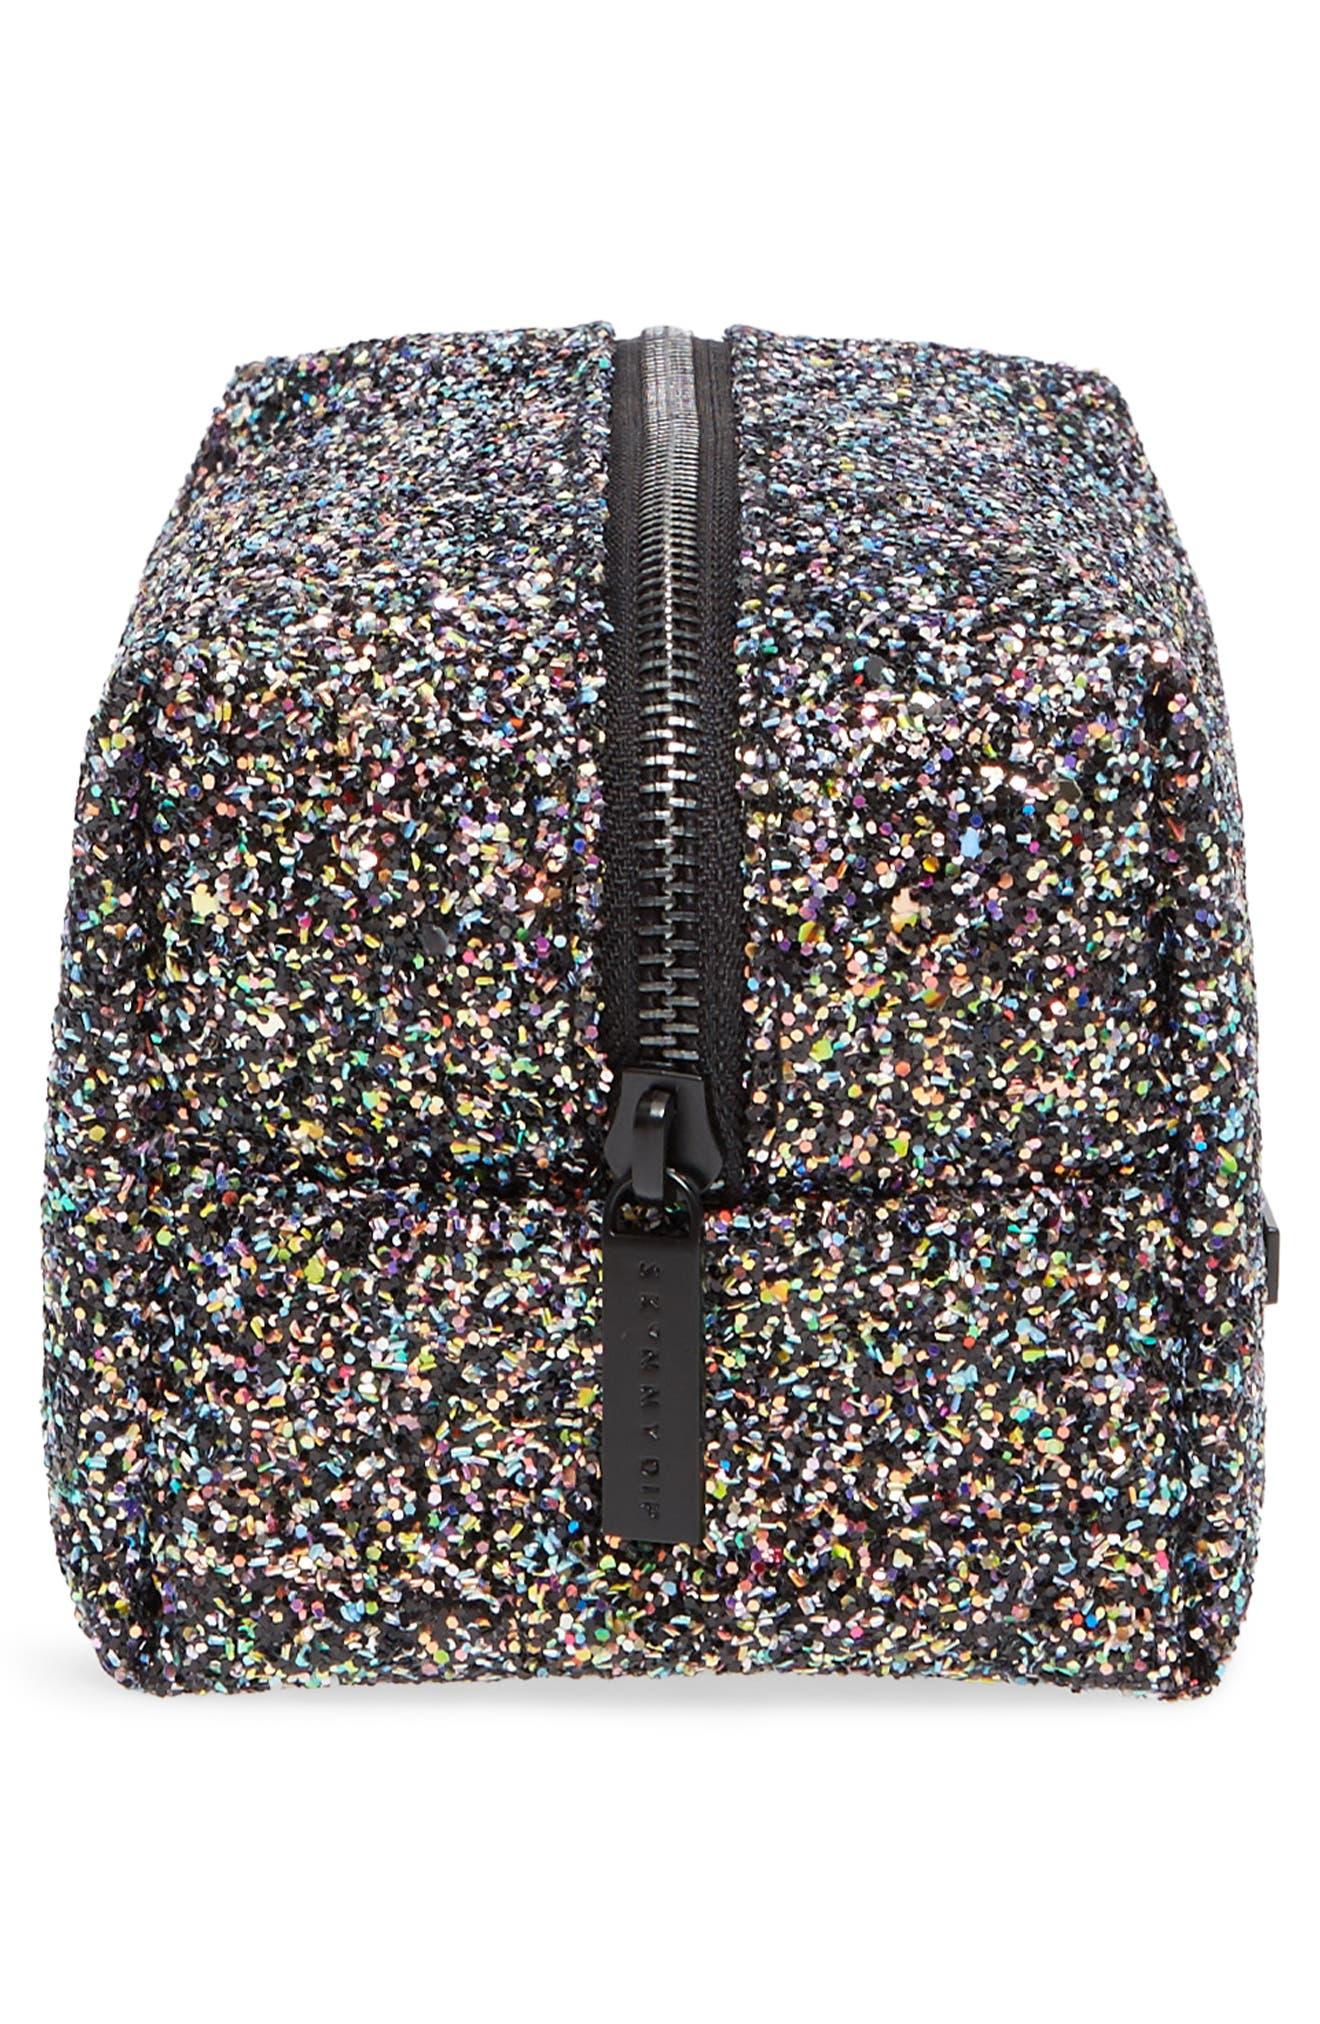 Skinny Dip Liquorice Glitter Cosmetics Bag,                             Alternate thumbnail 4, color,                             000